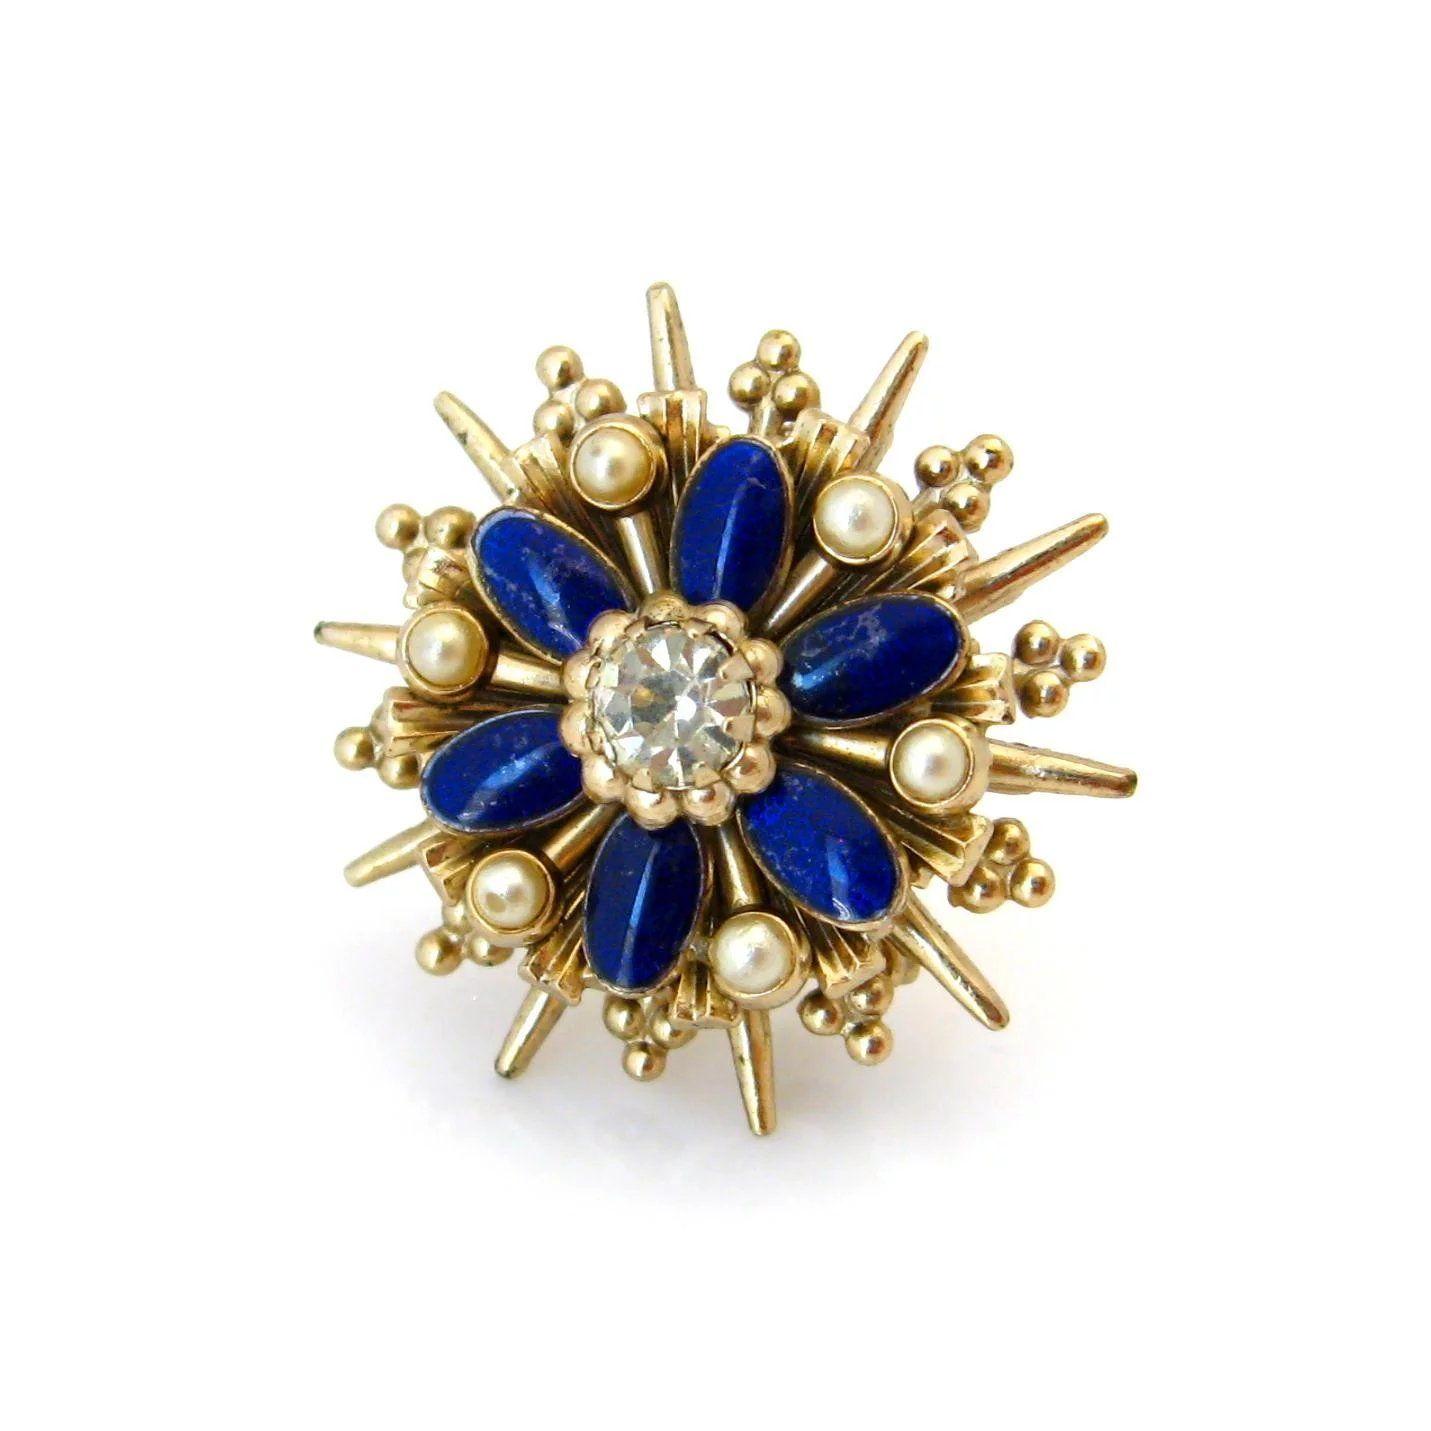 Gold Tone Faux Pearl Rhinestone  Brooch Pin Drop Pearl Gold Vintage Costume Fashion Jewelry Designer Shawl Scarf Pin Bridal Red Blue Green